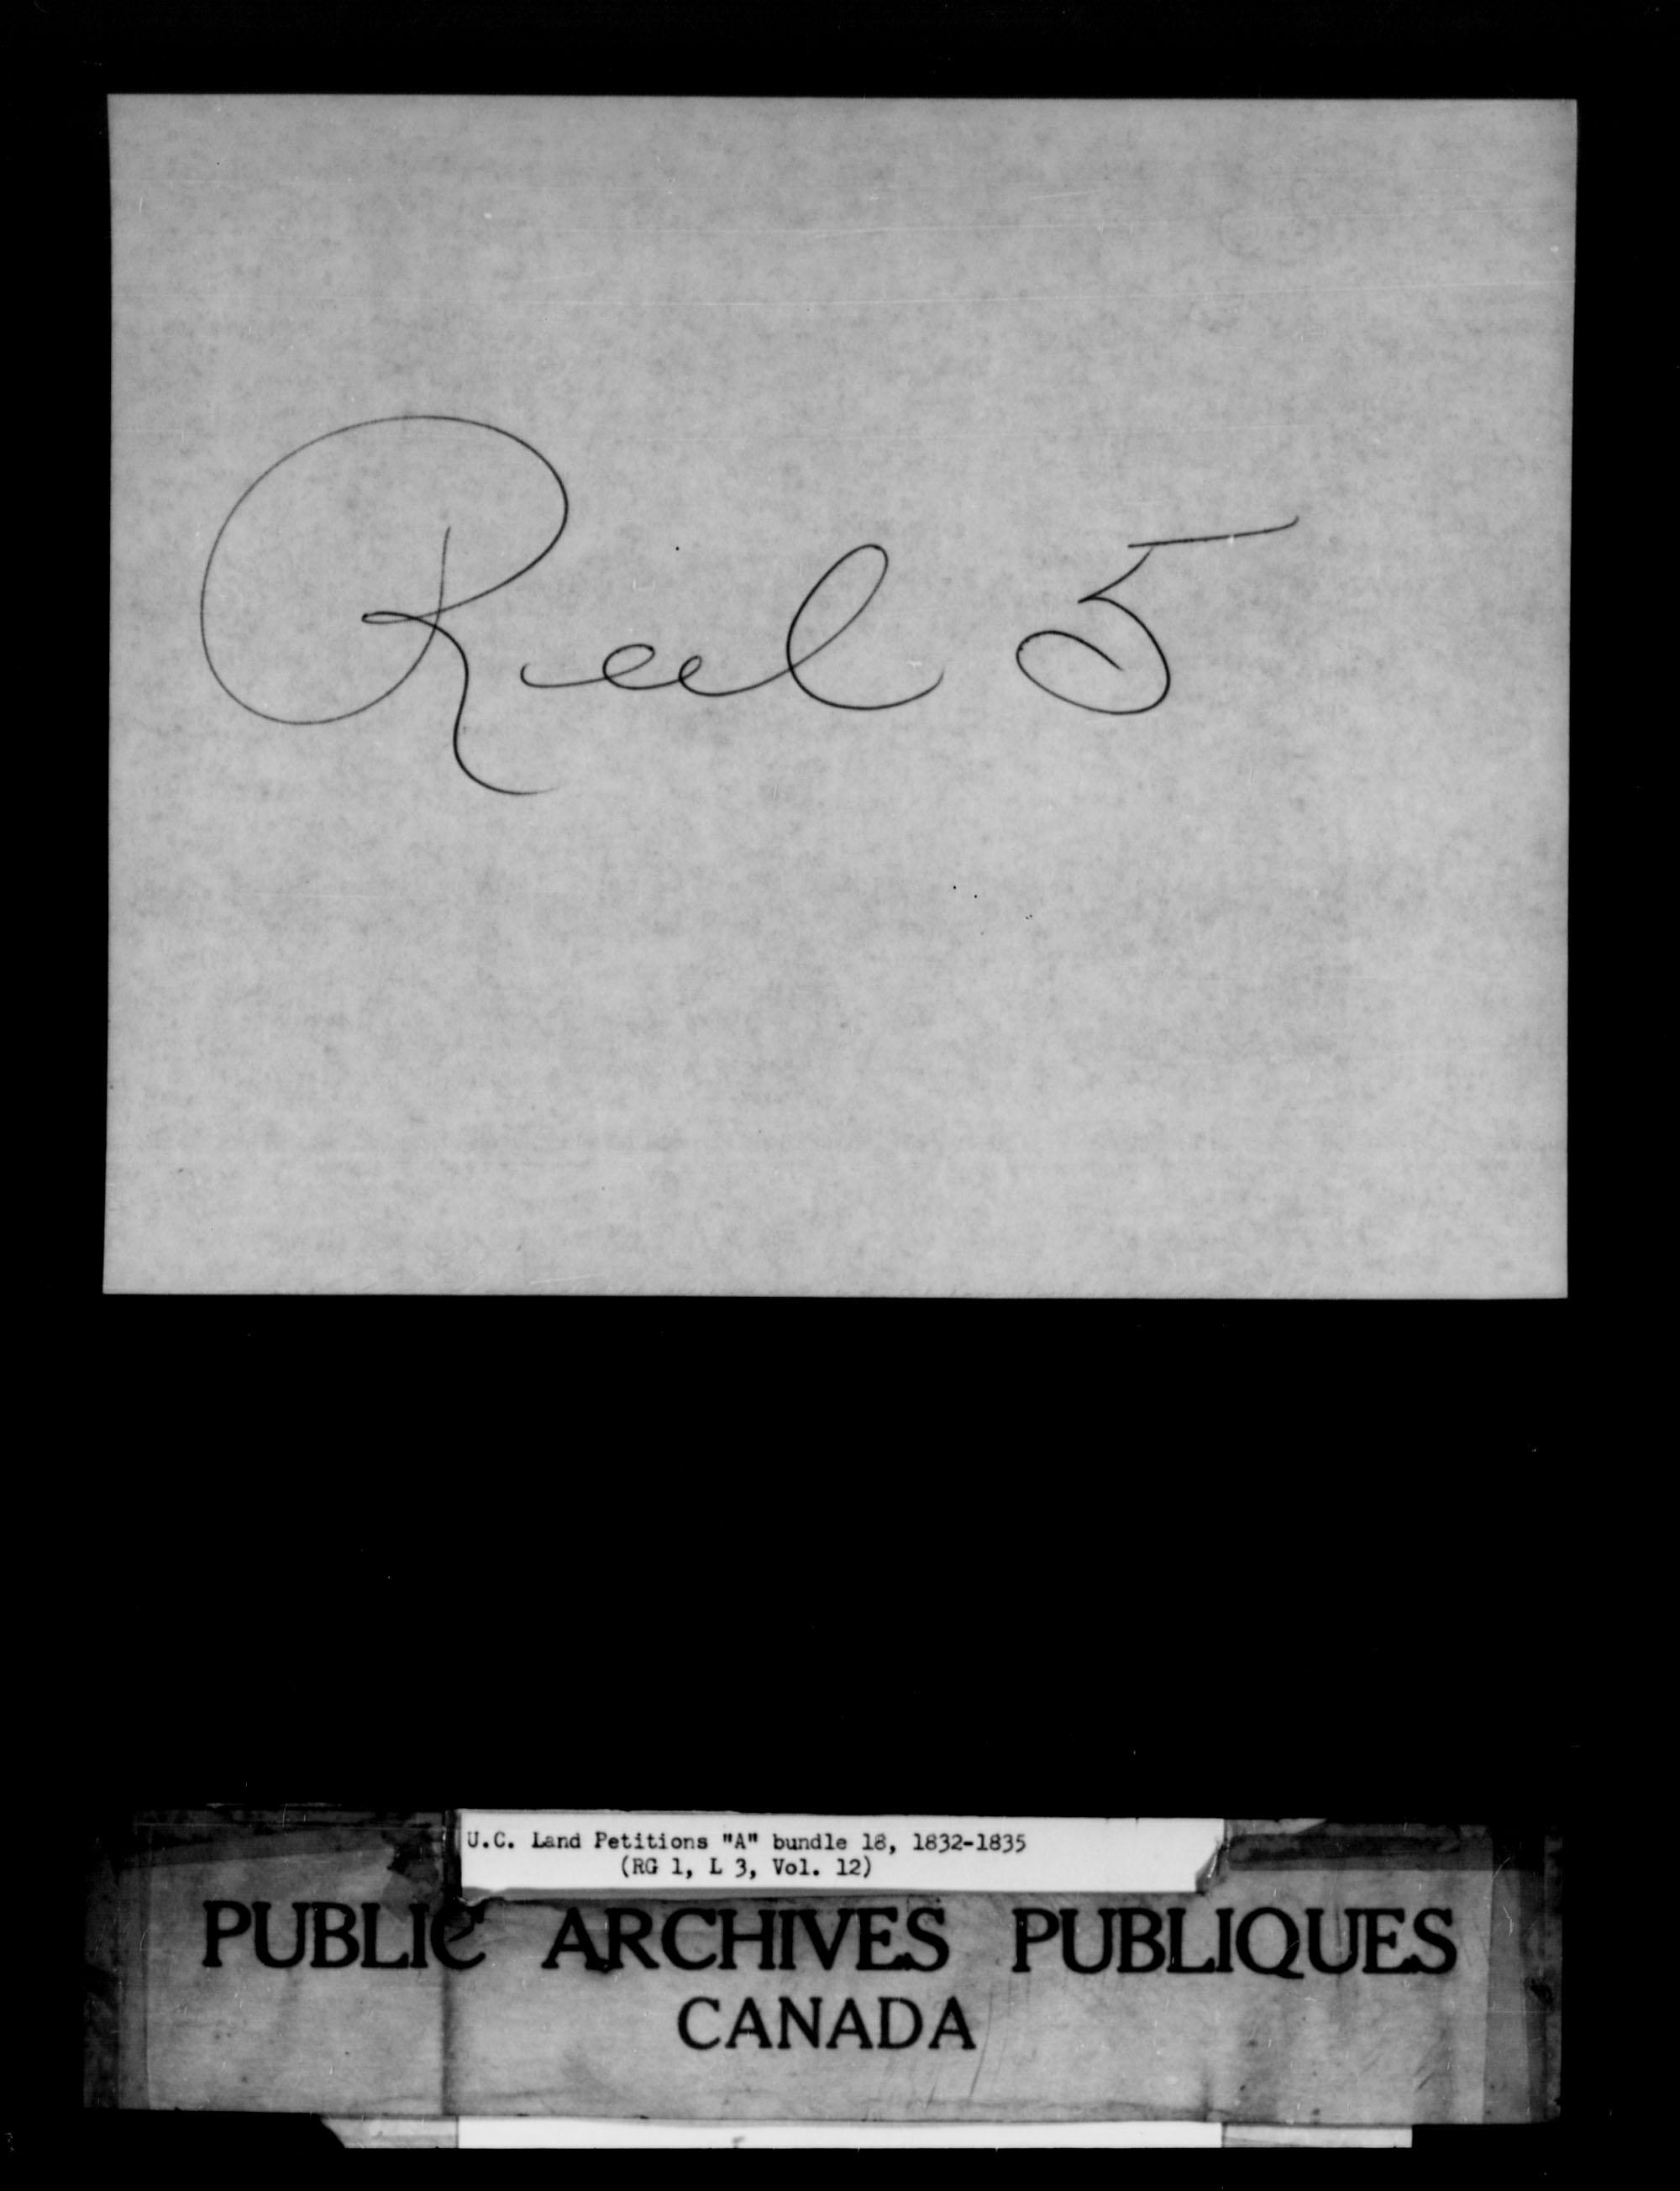 Titre: Demandes de terres du Haut-Canada (1763-1865) - N° d'enregistrement Mikan: 205131 - Microforme: c-1613